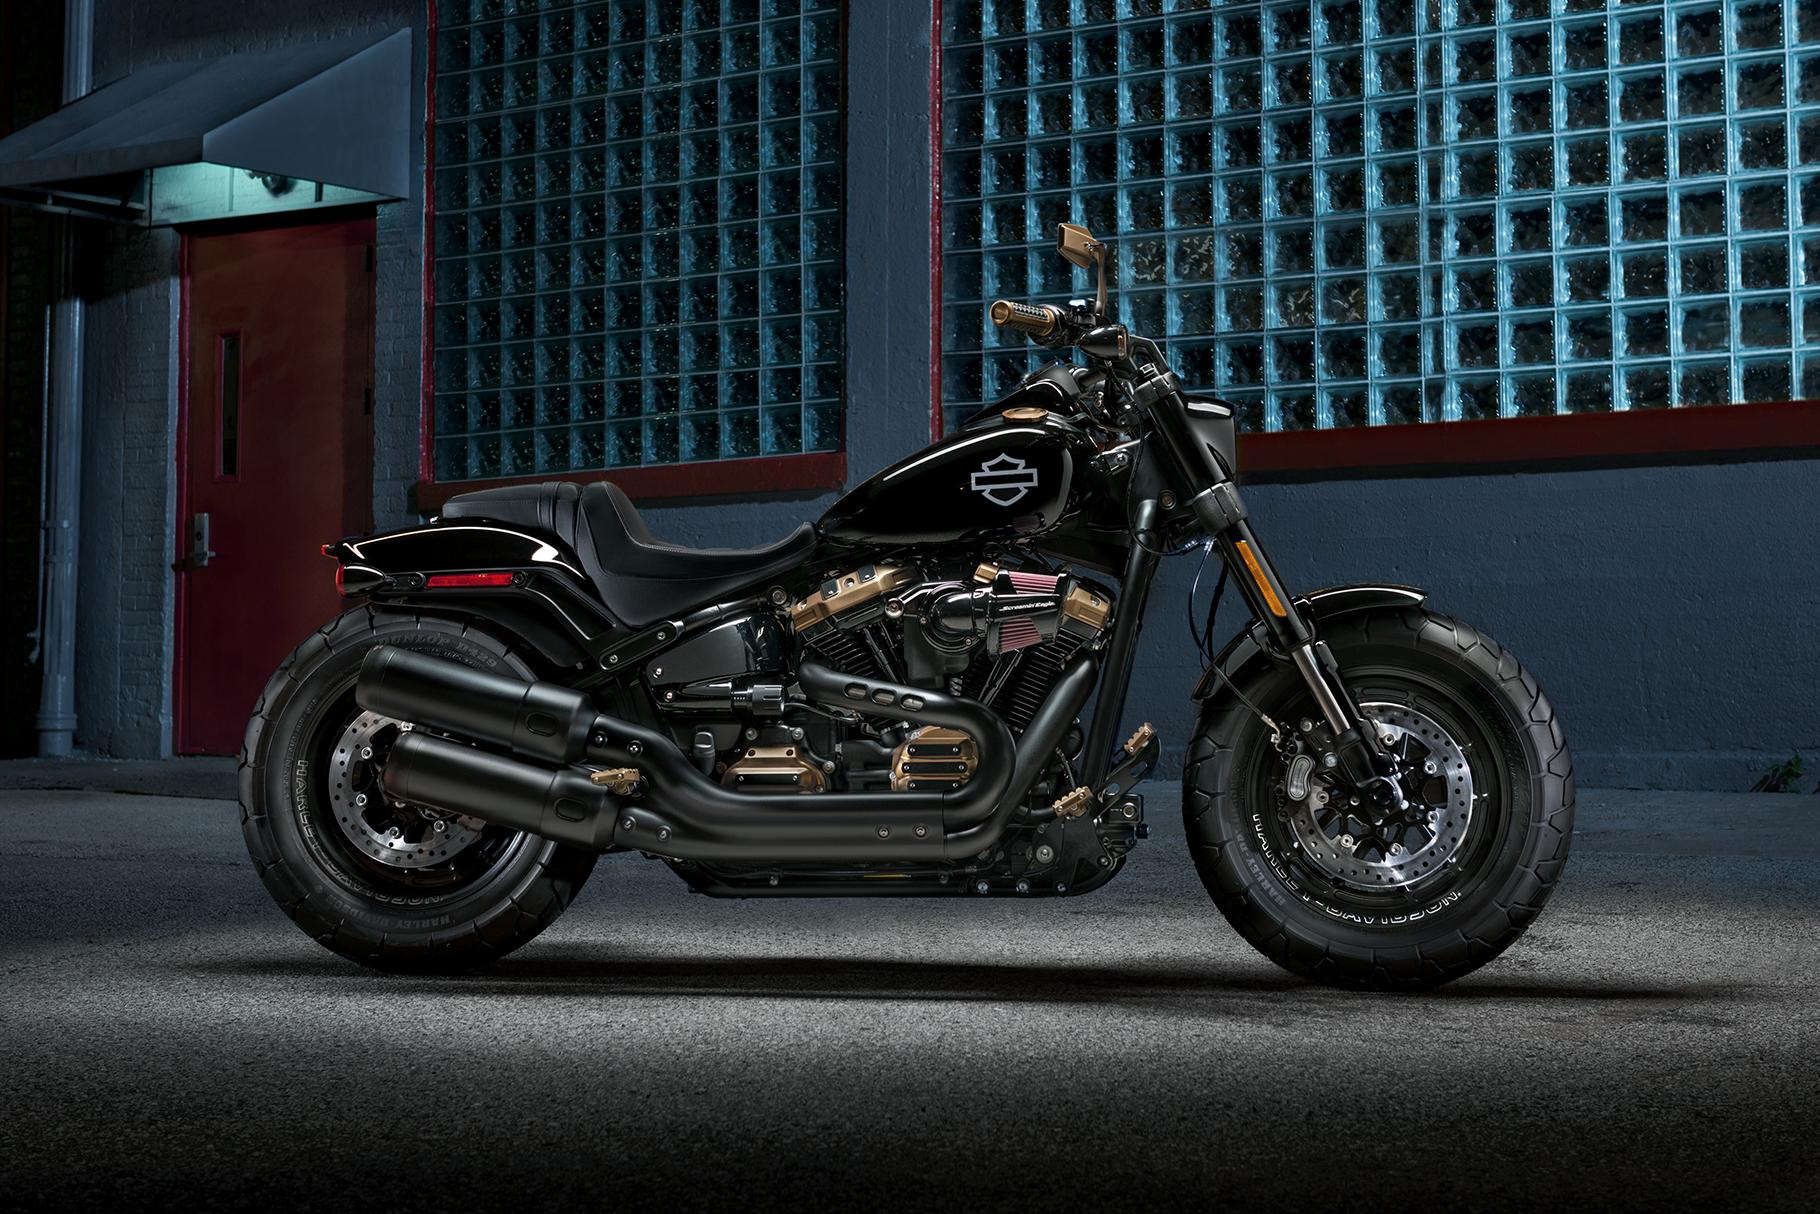 2019 fat bob motorcycle harley davidson australia new zealand - Sigle harley davidson ...